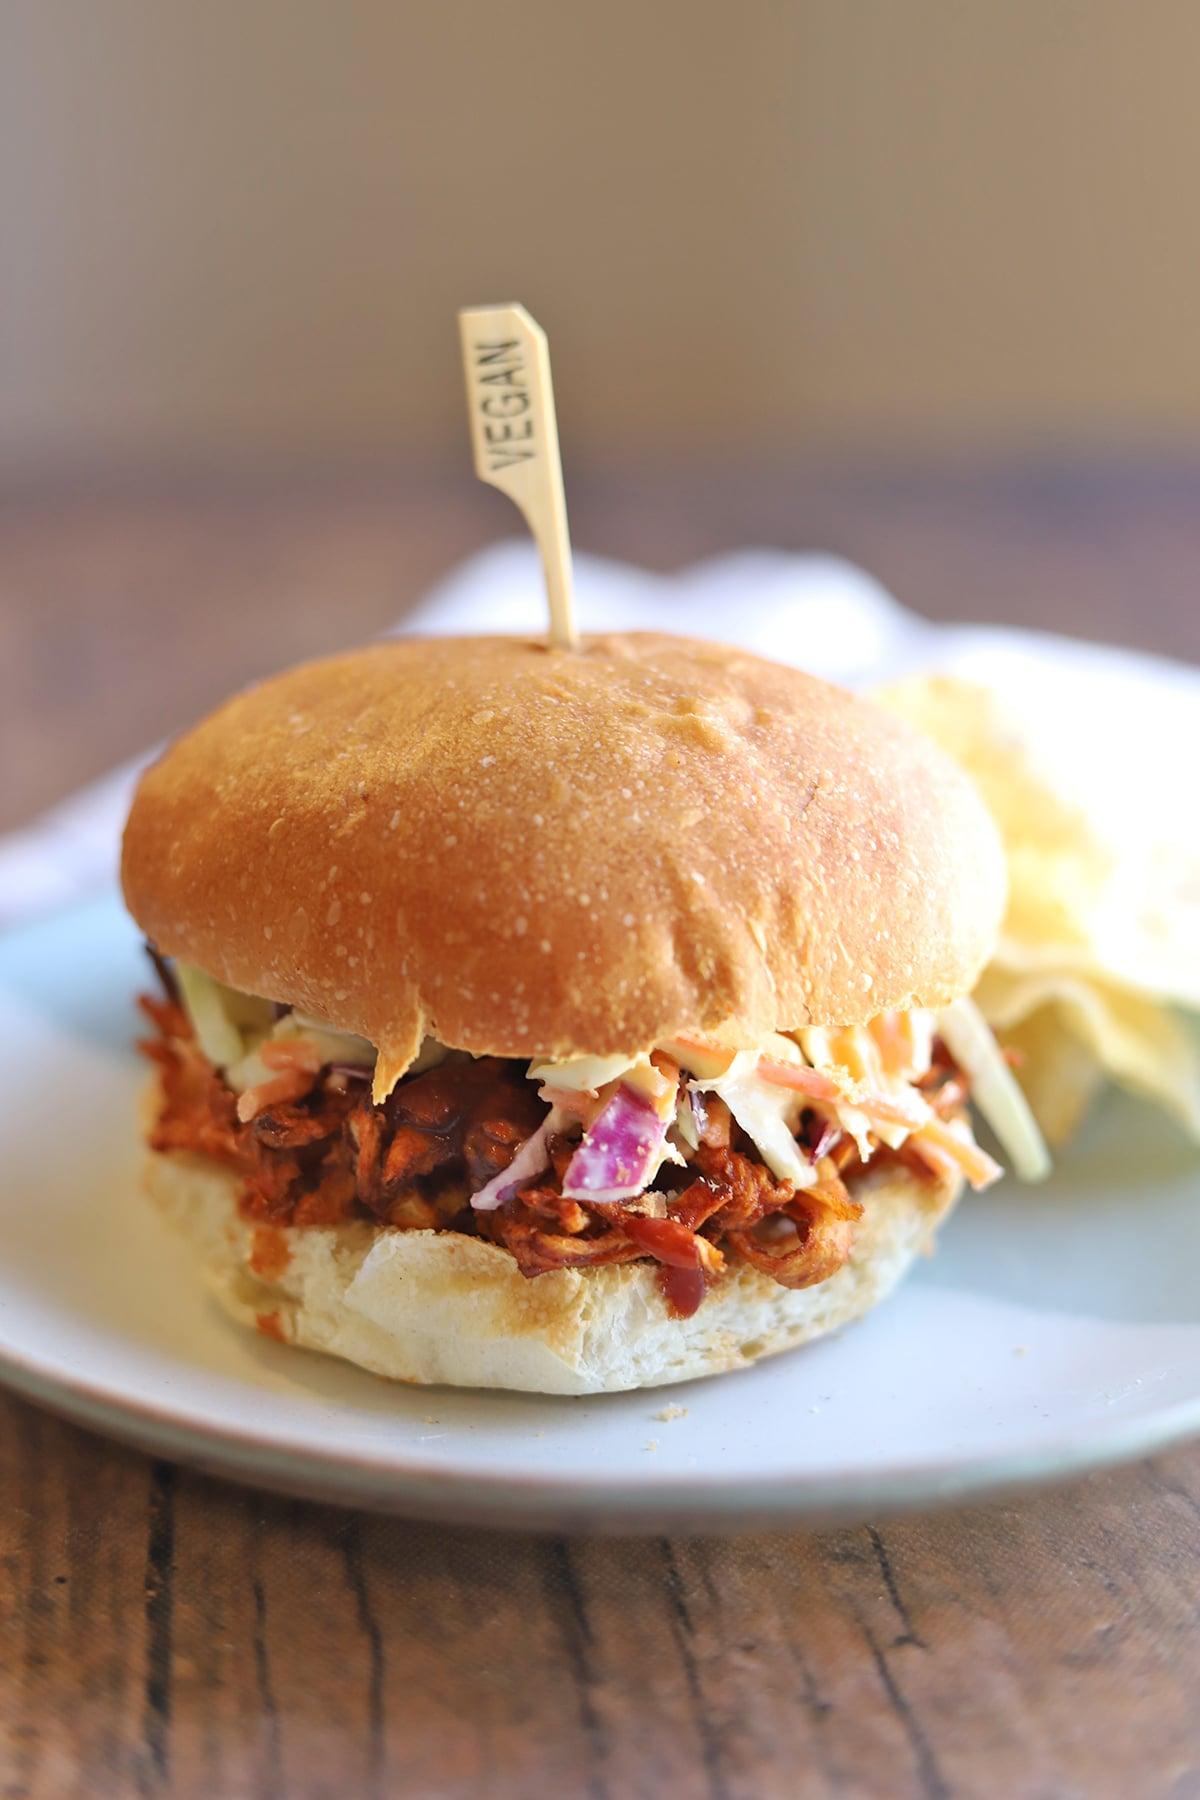 Vegan pulled pork sandwich on table.